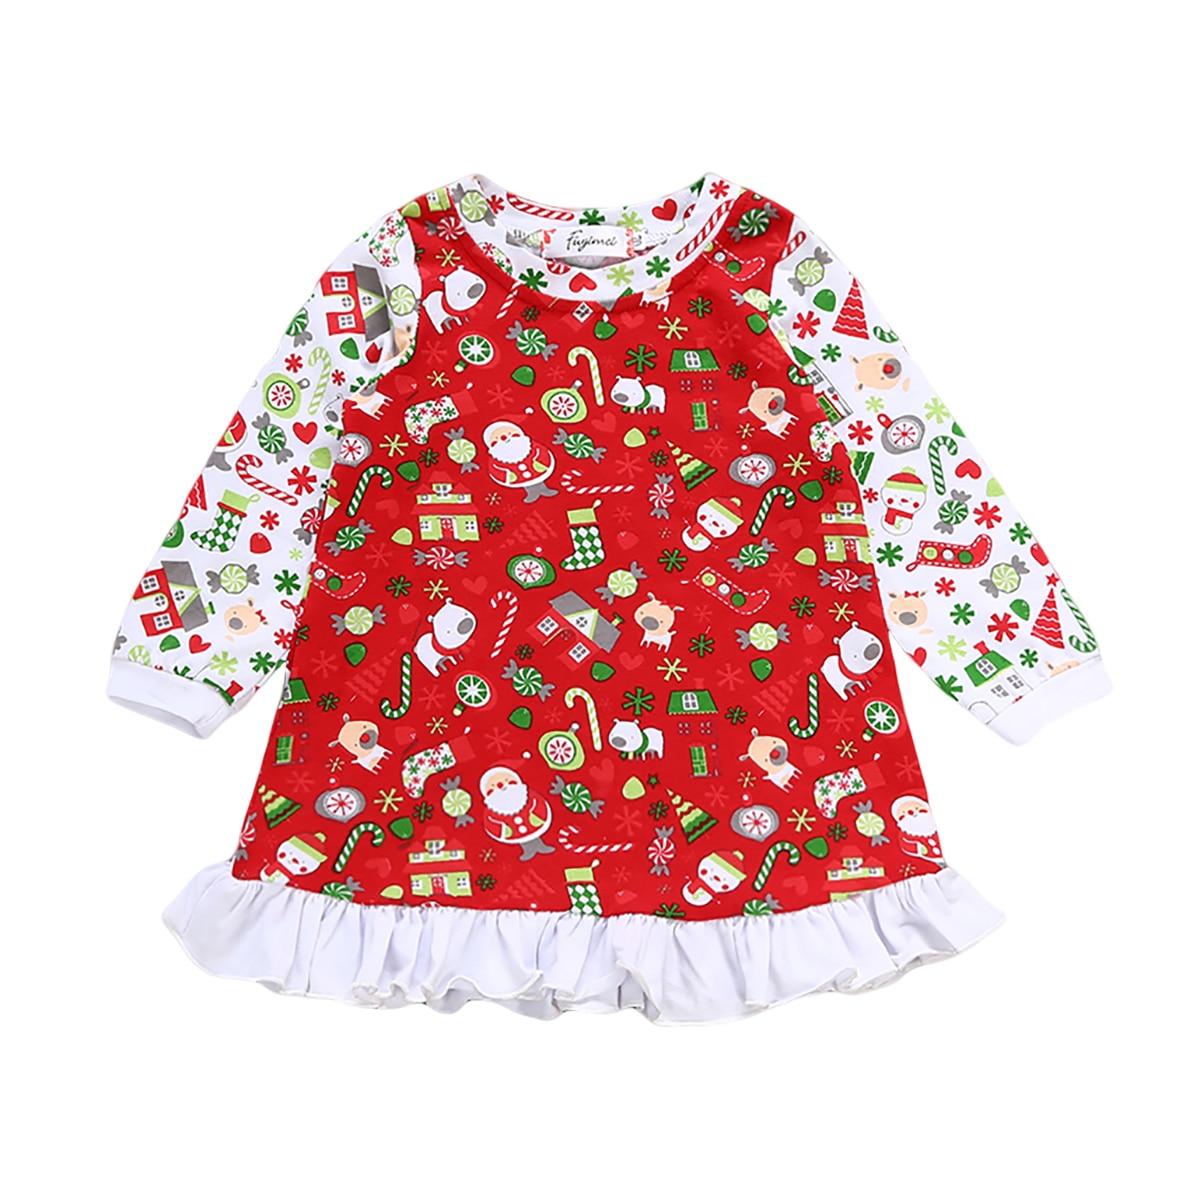 Toddler Kids Baby Girls Princess Deer Dress Xmas Party Casual Dresses Clothes